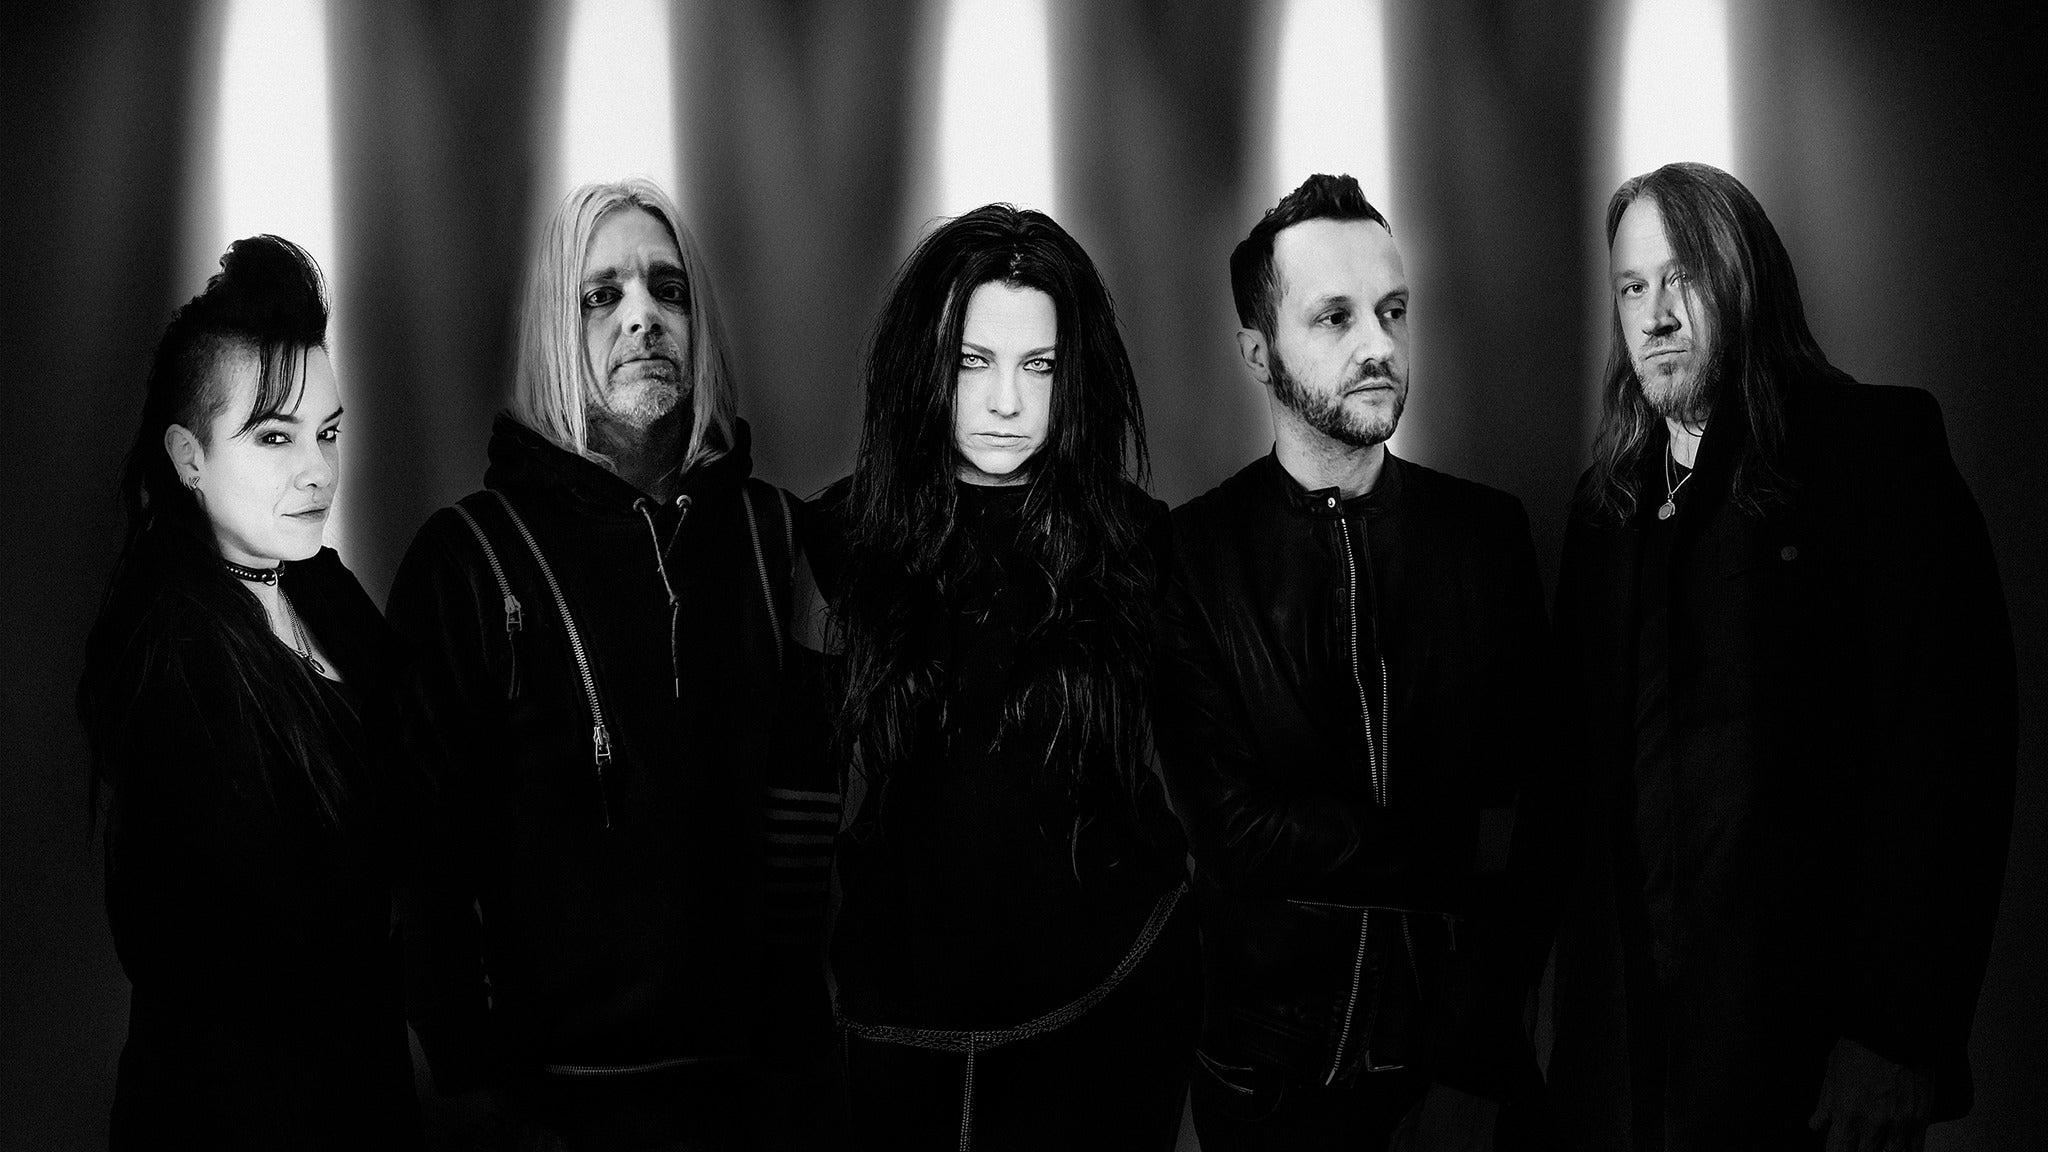 WMMR Presents Evanescence + Halestorm at BB&T Pavilion